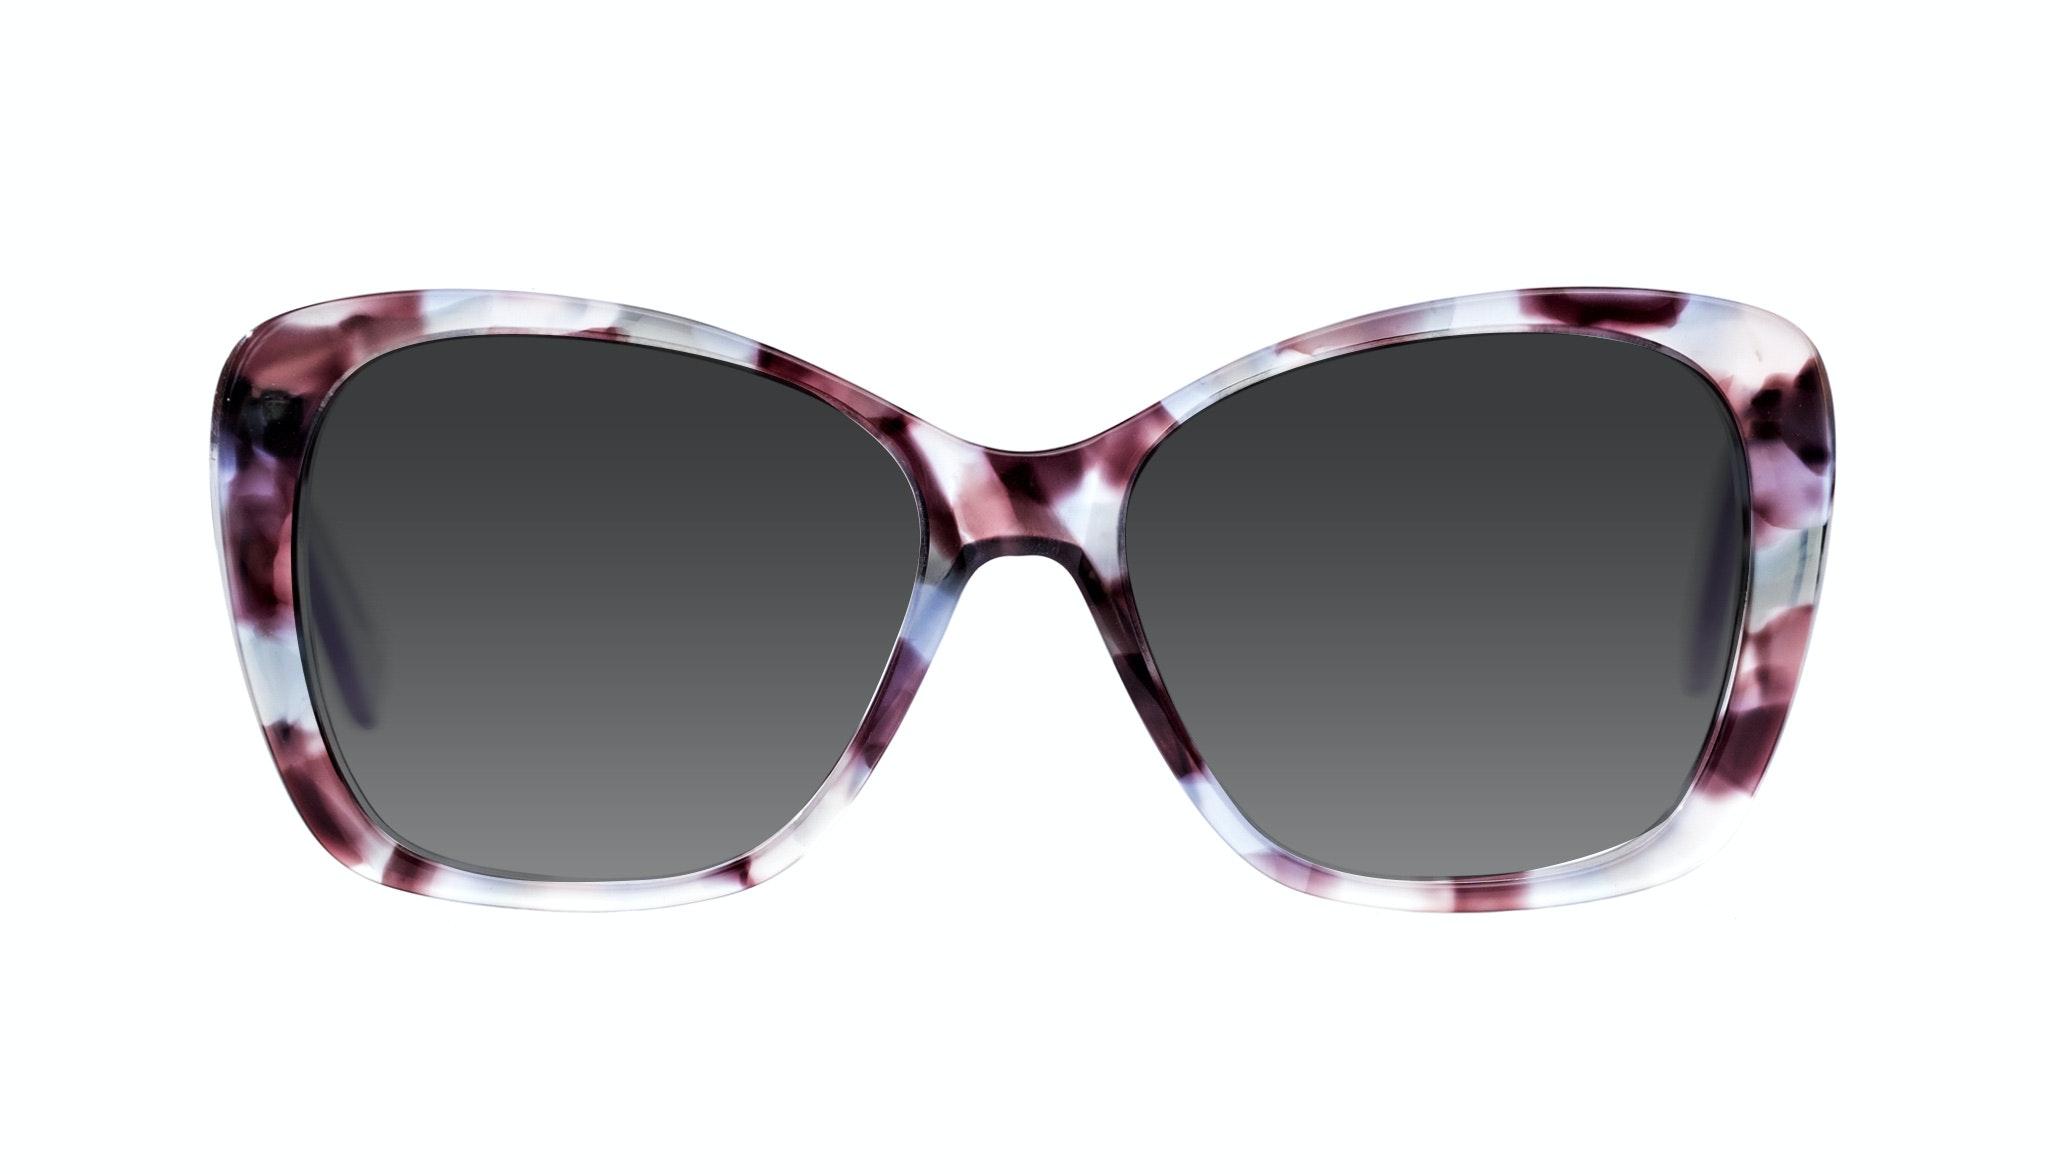 Affordable Fashion Glasses Cat Eye Square Sunglasses Women Charm Lilac Tort